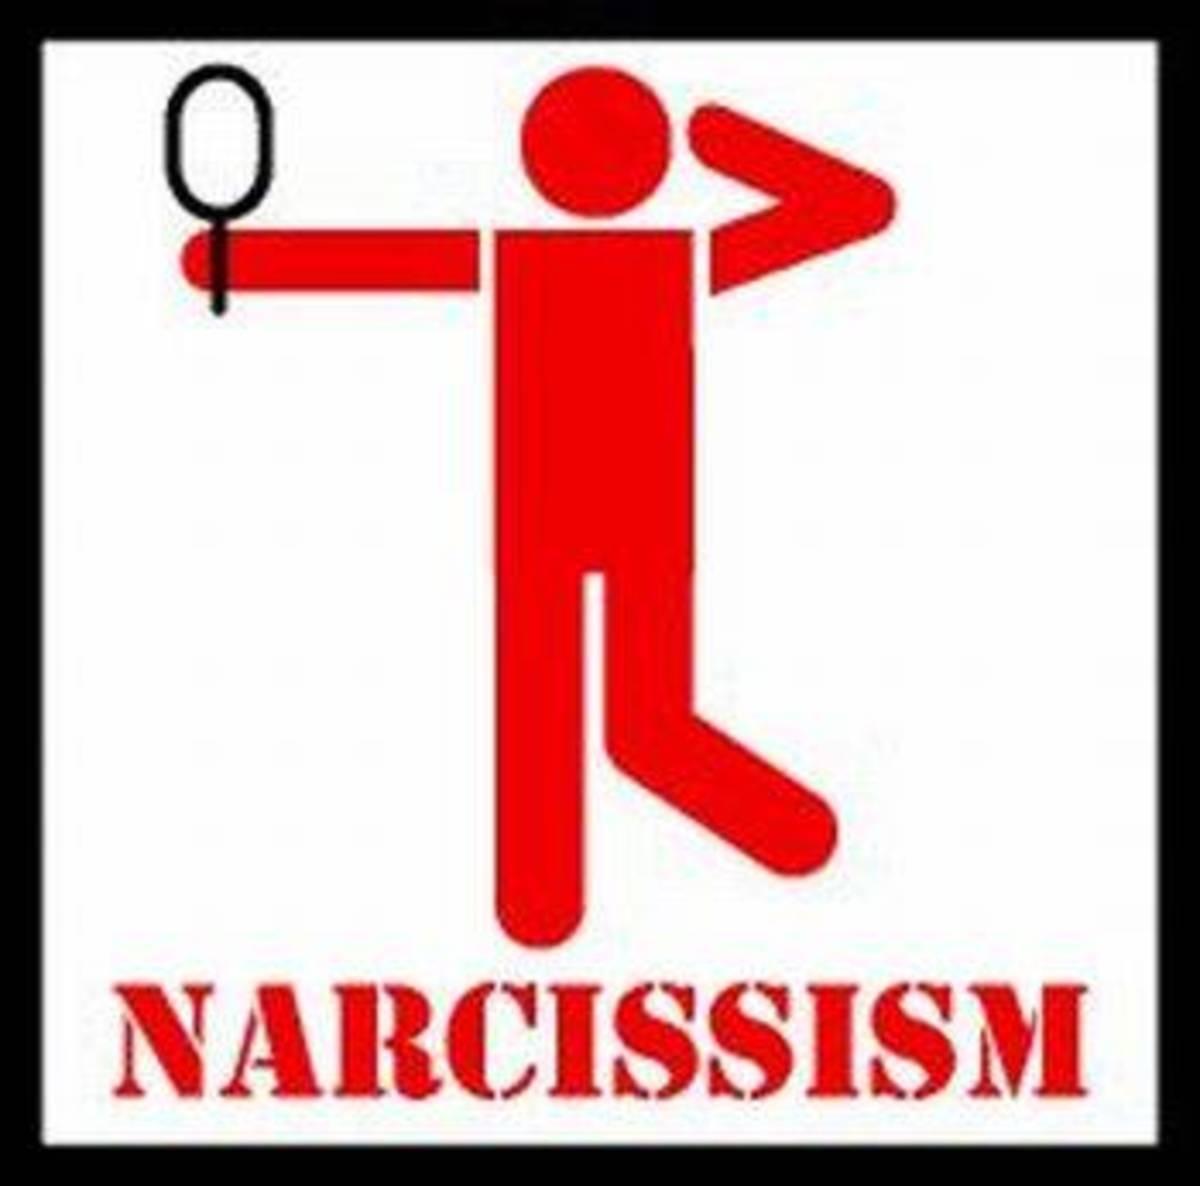 Symptoms of Narcissism